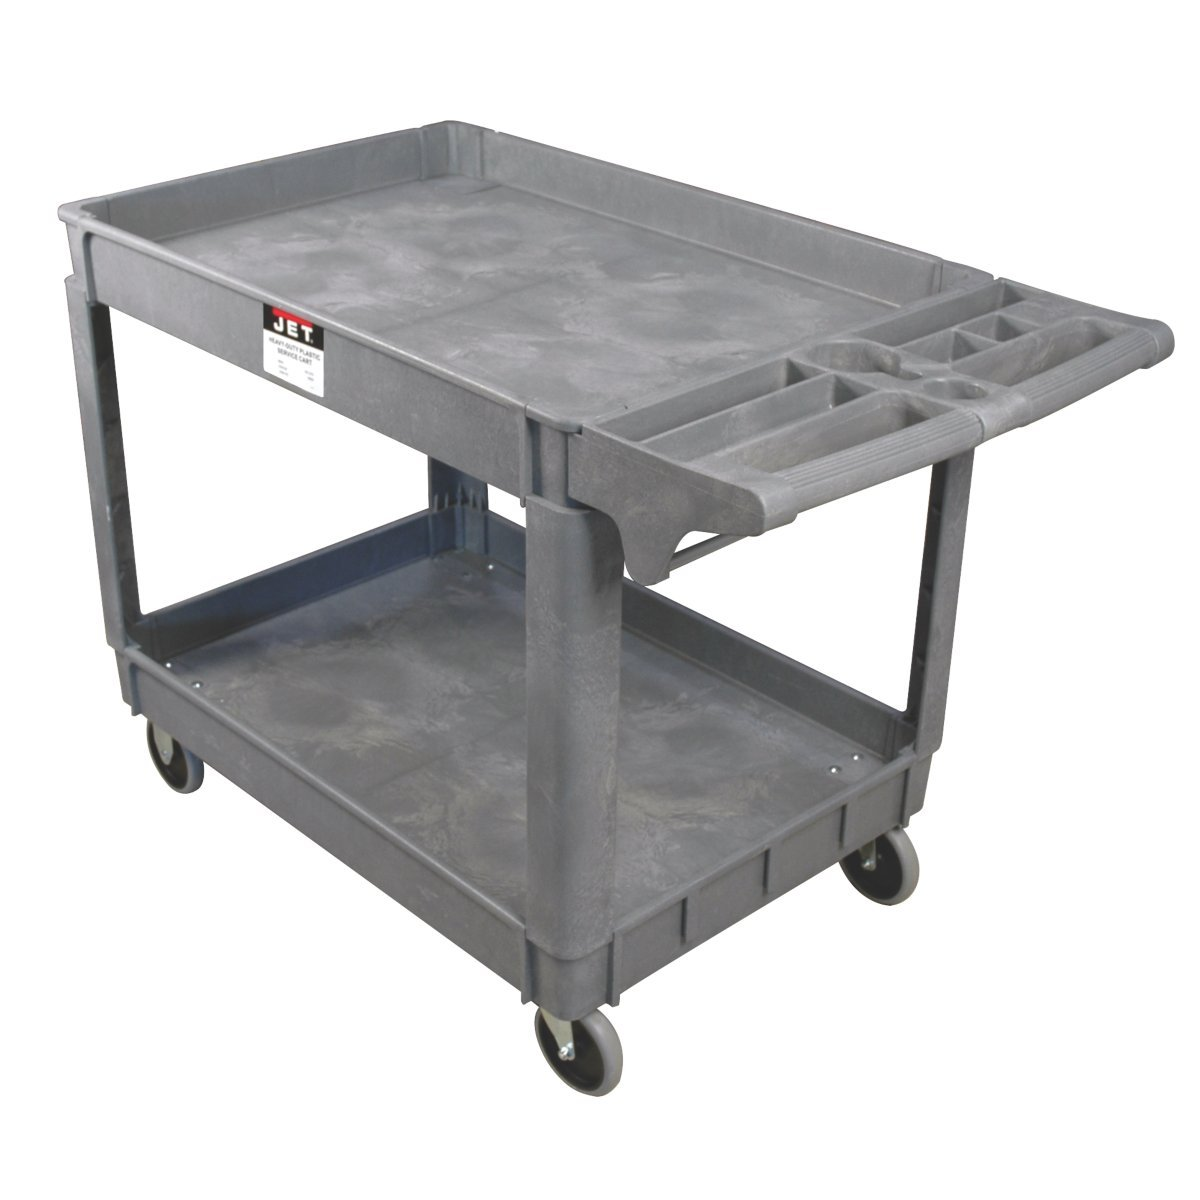 JET PUC-3725 Resin Utility Cart